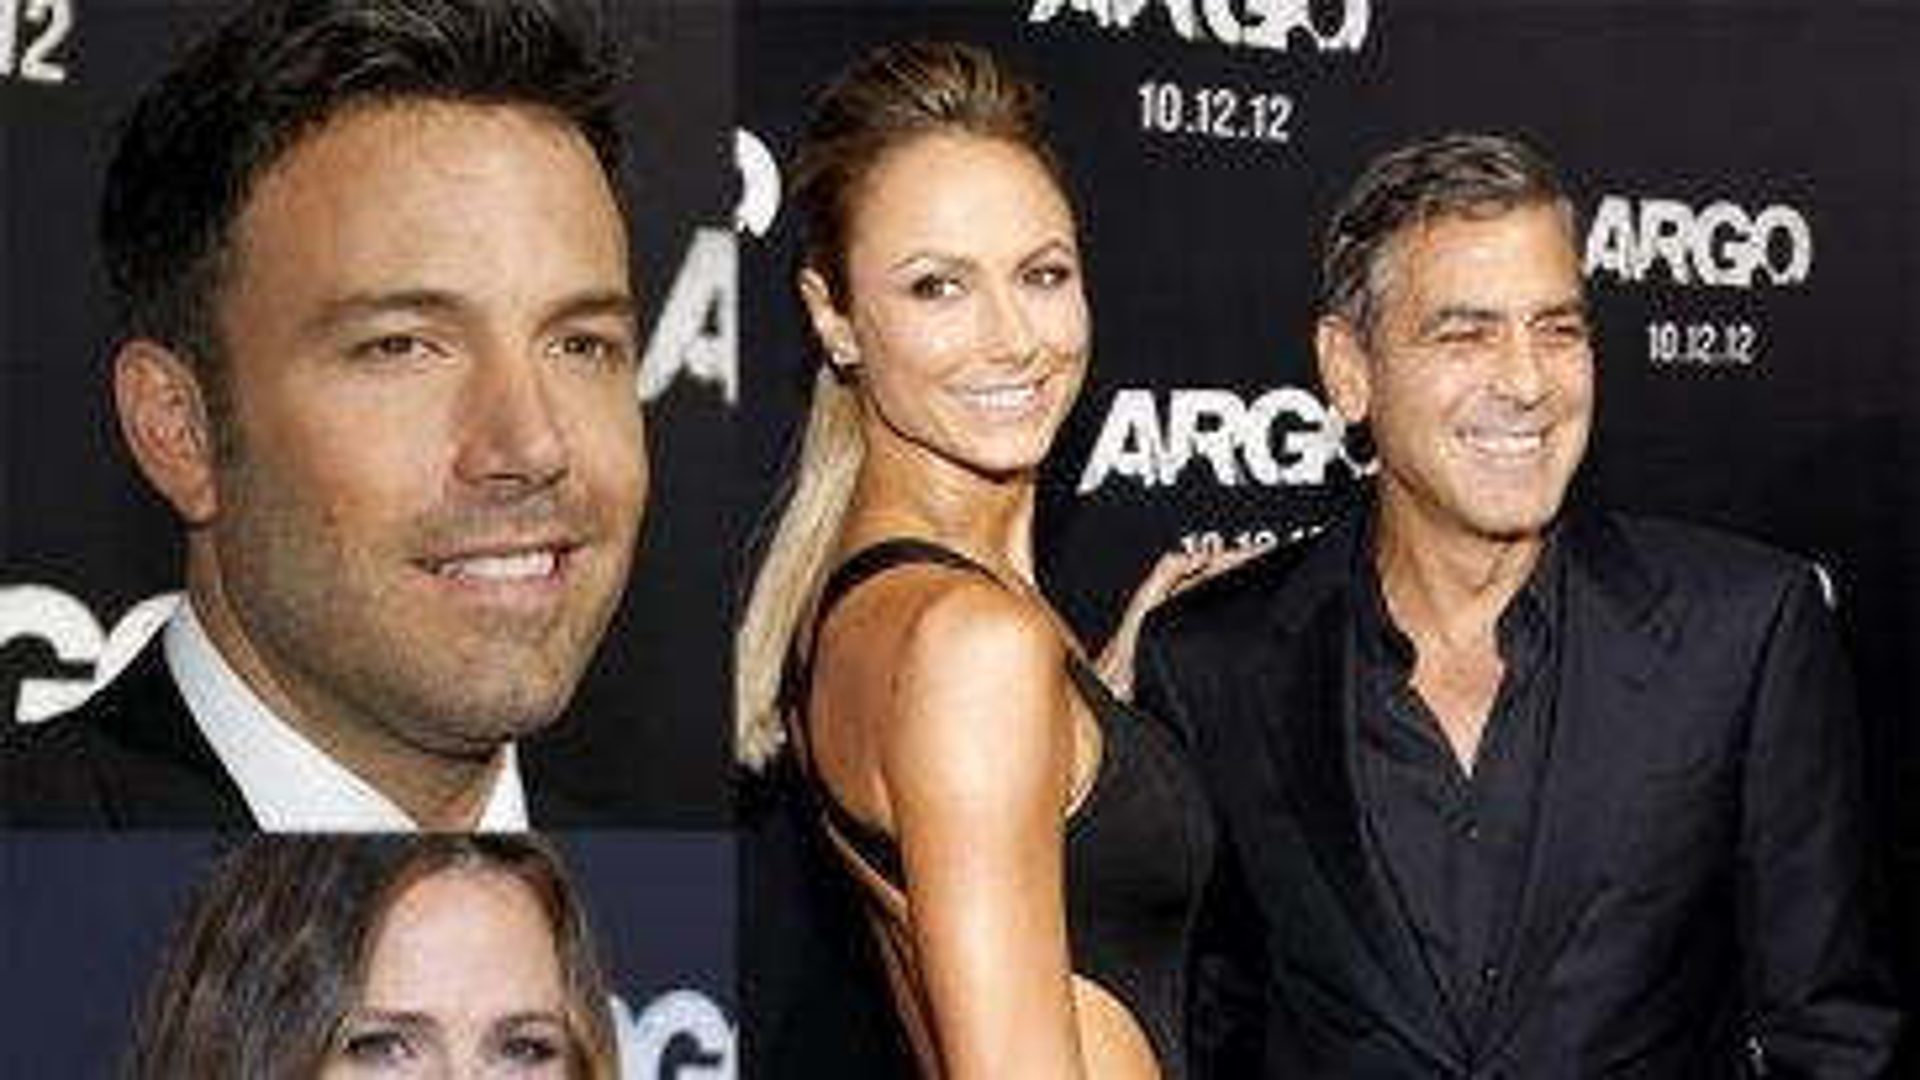 George-Clooney-Ben-Affleck-Jennifer-Garner-Argo-Premiere